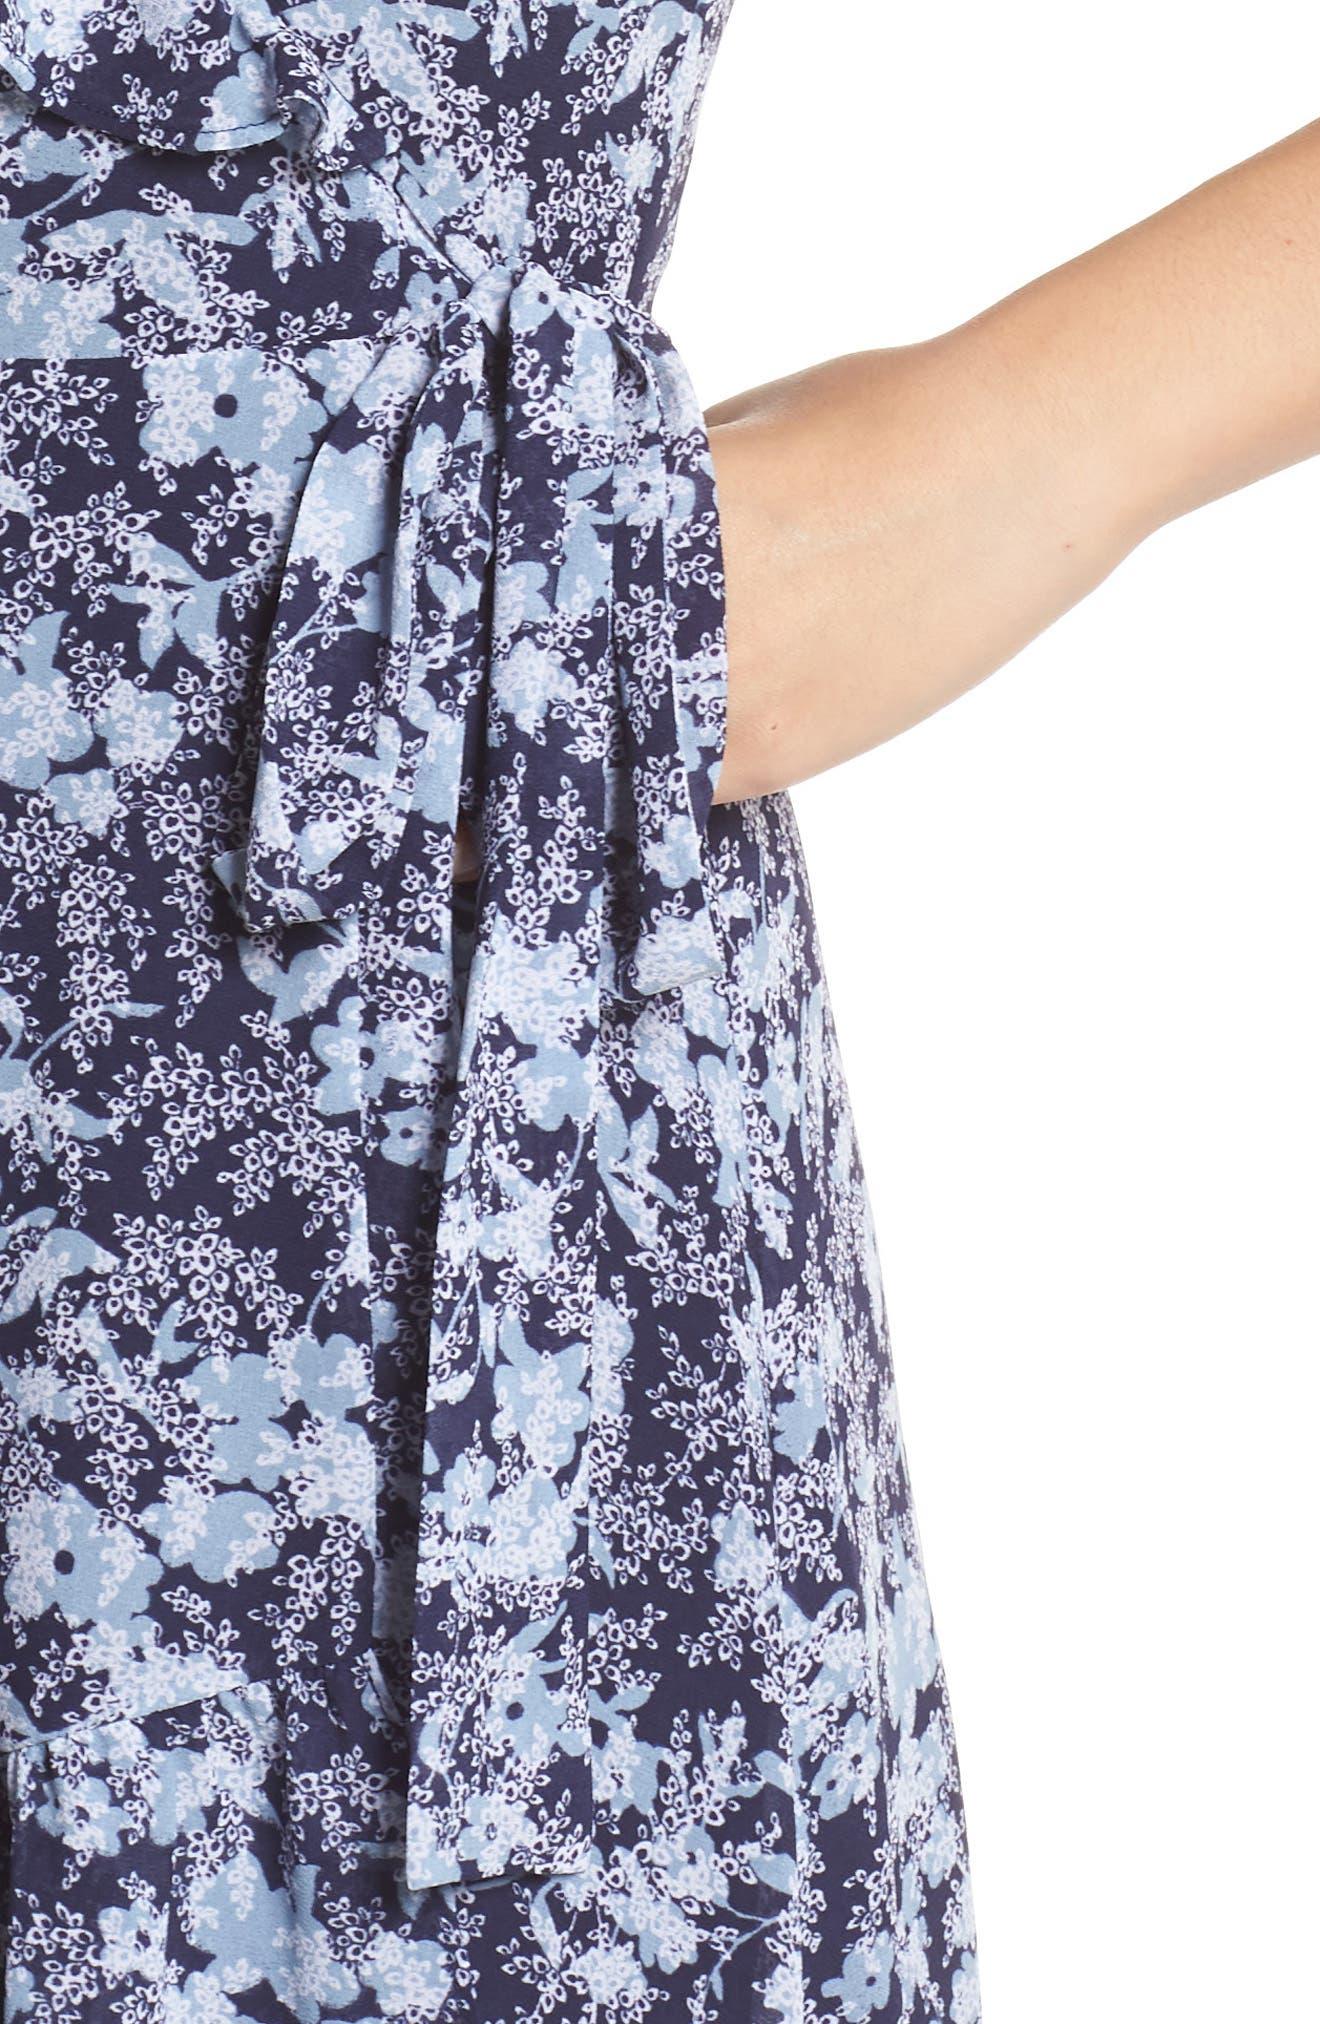 MICHAEL MICHAEL KORS, Ruffle Wrap Dress, Alternate thumbnail 5, color, TRUE NAVY/CHAMBRAY